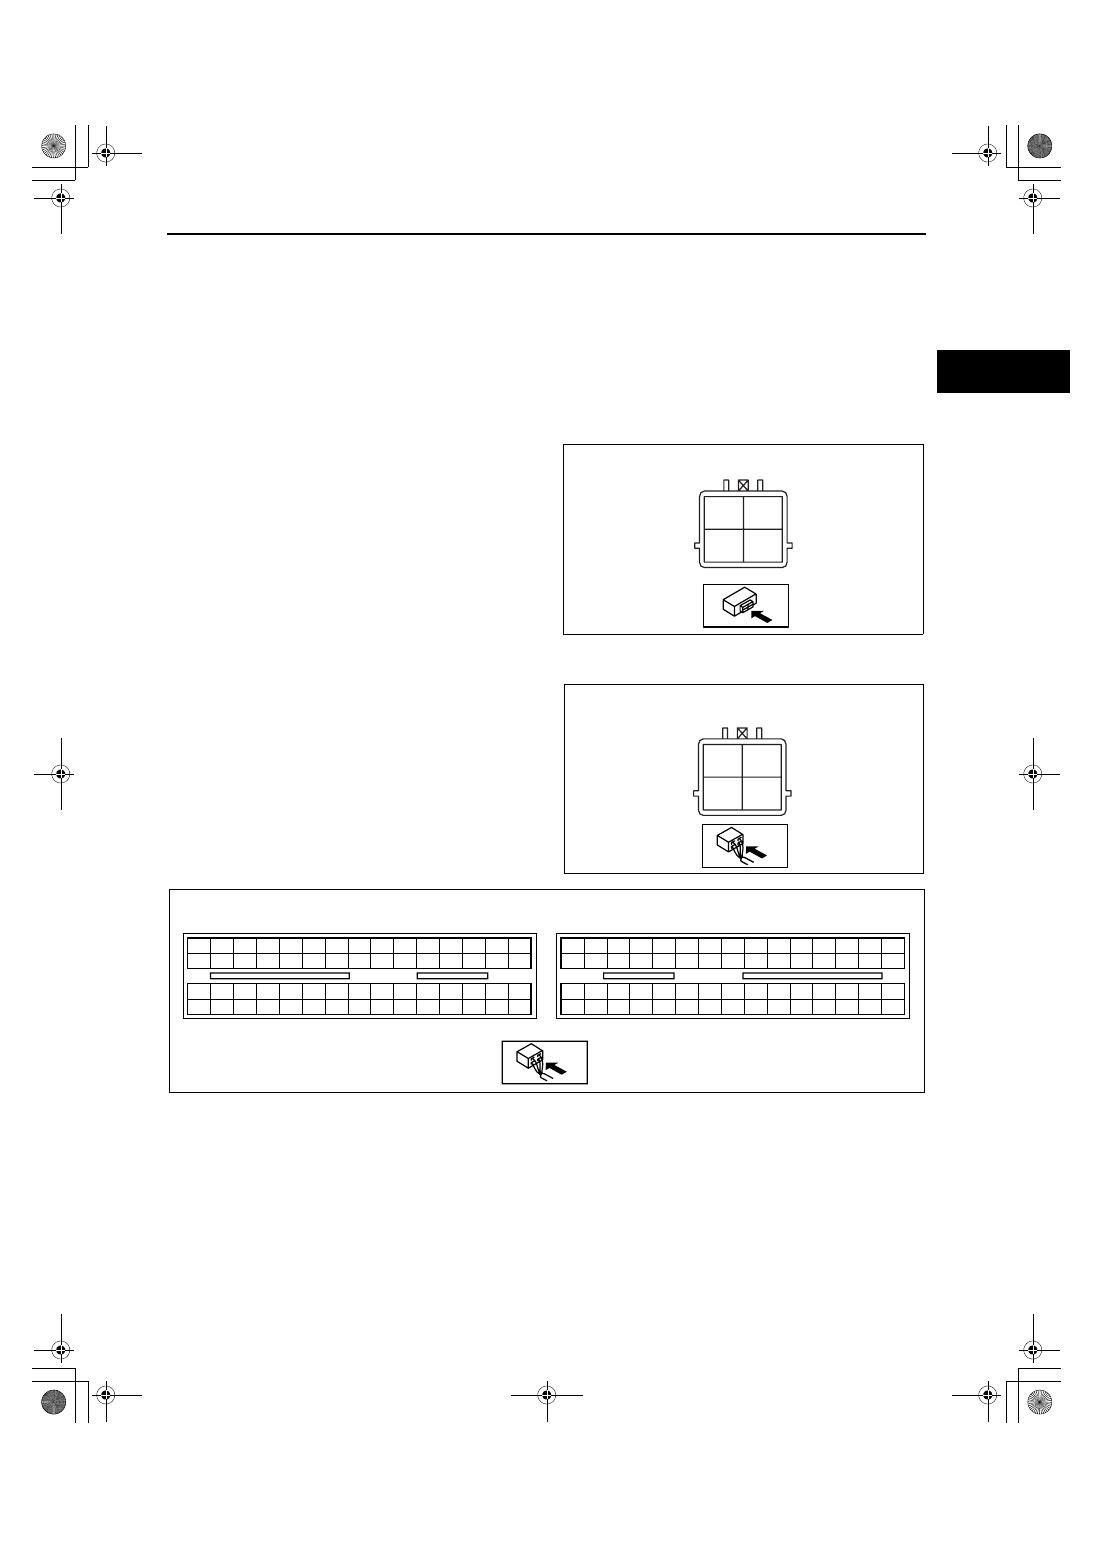 mazda cx 7 manual part 150 rh zinref ru Residential Wiring Circuits Electrical Wiring Diagrams For Dummies